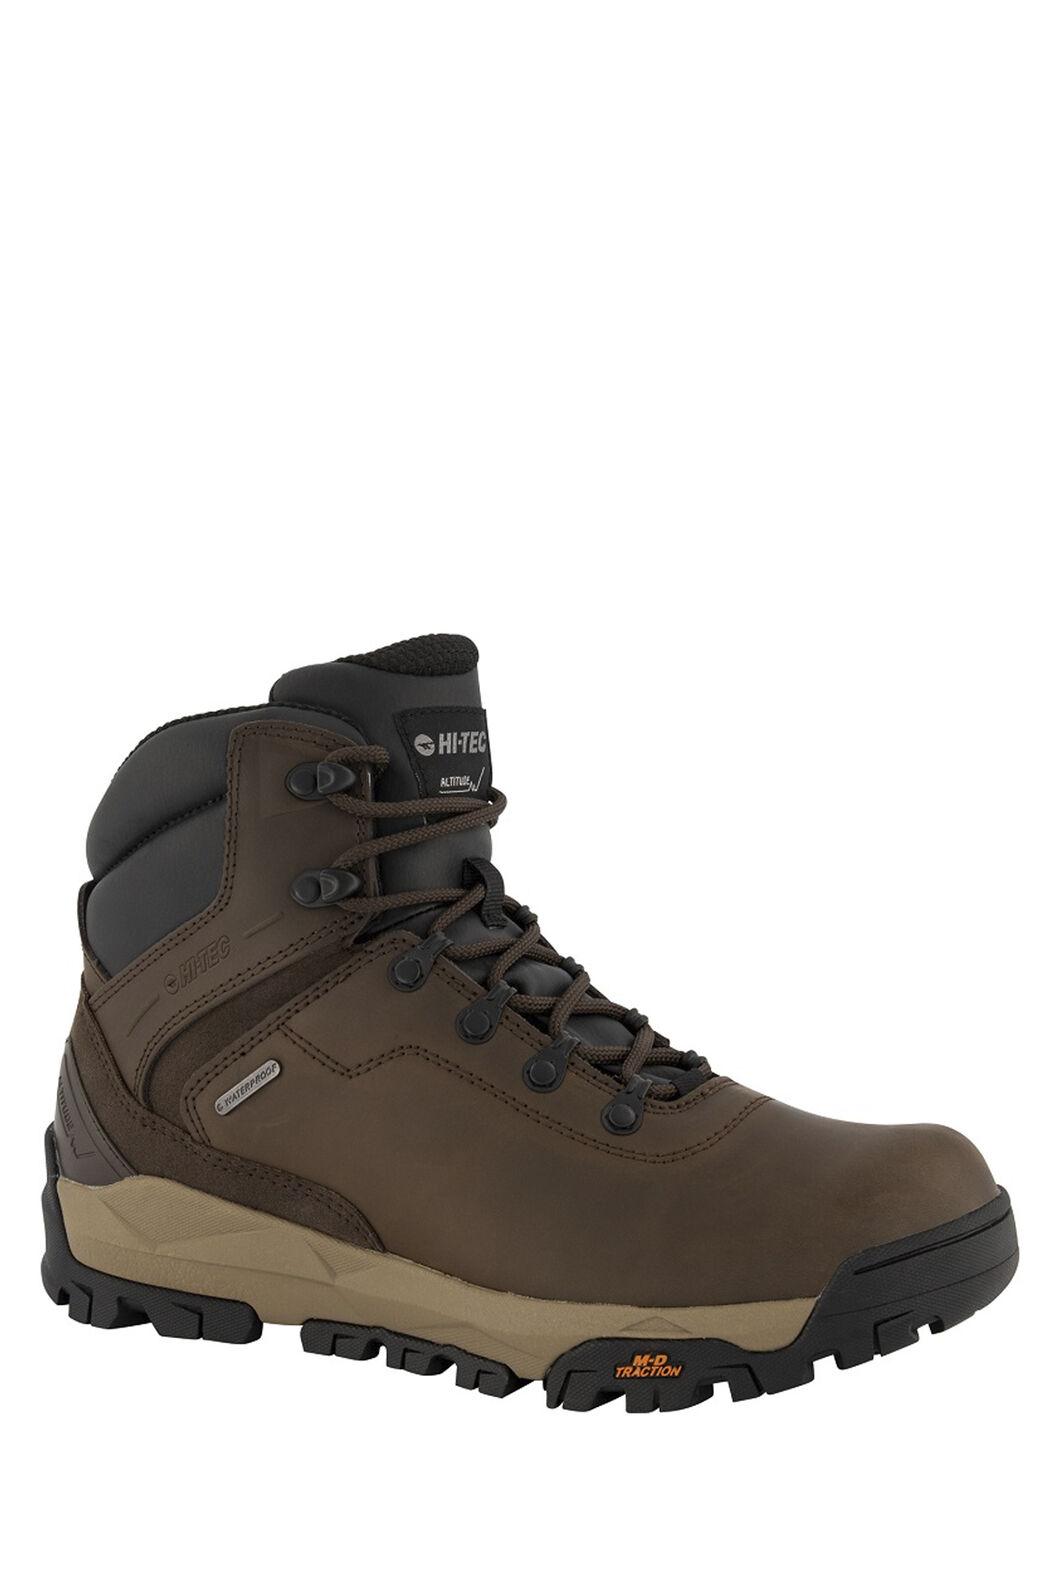 Hi-Tec Altitude Infinity AL Mid WP Hiking Boots — Men's, Dark Chocolate/Taupe/Black, hi-res